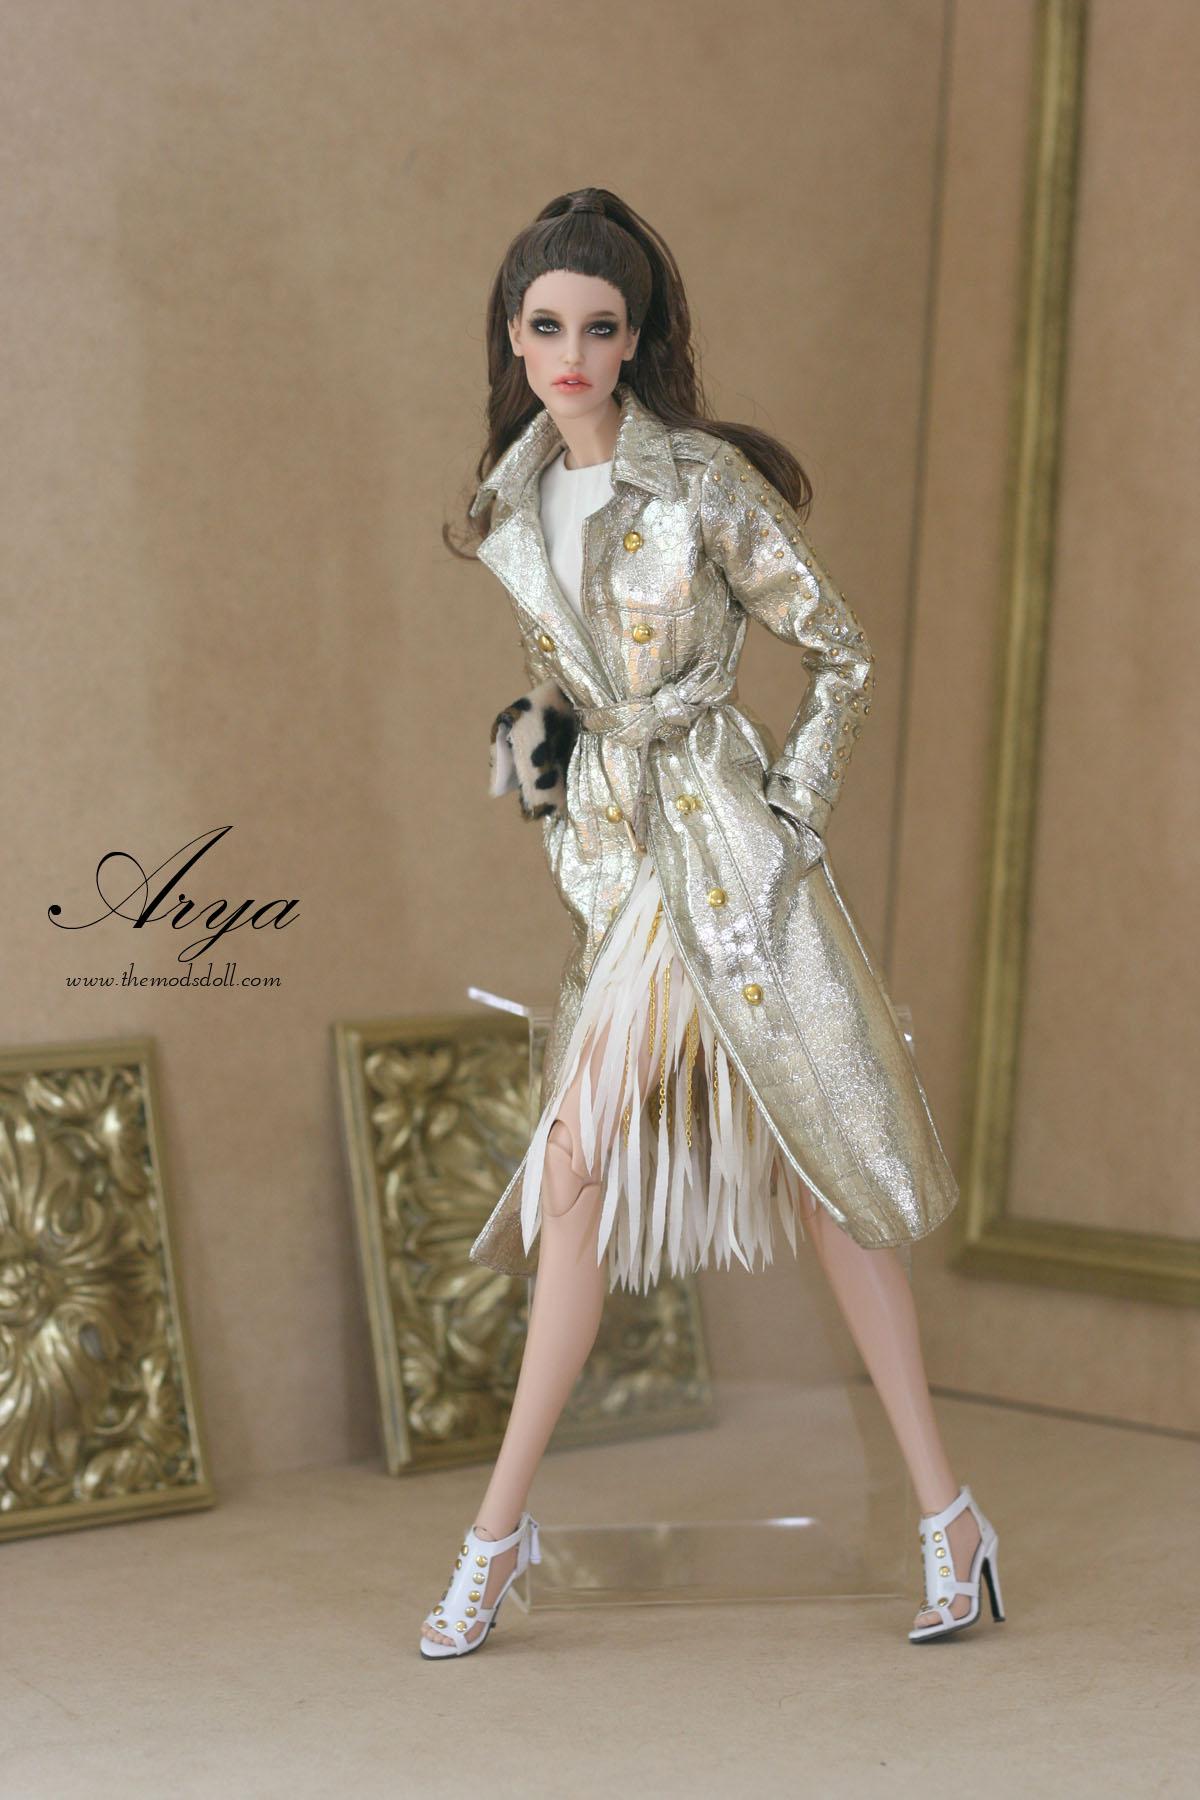 Les mannequins Modsdoll - P 1 Brontë - P3 Chloe - P4 Asali - Page 4 17Arya